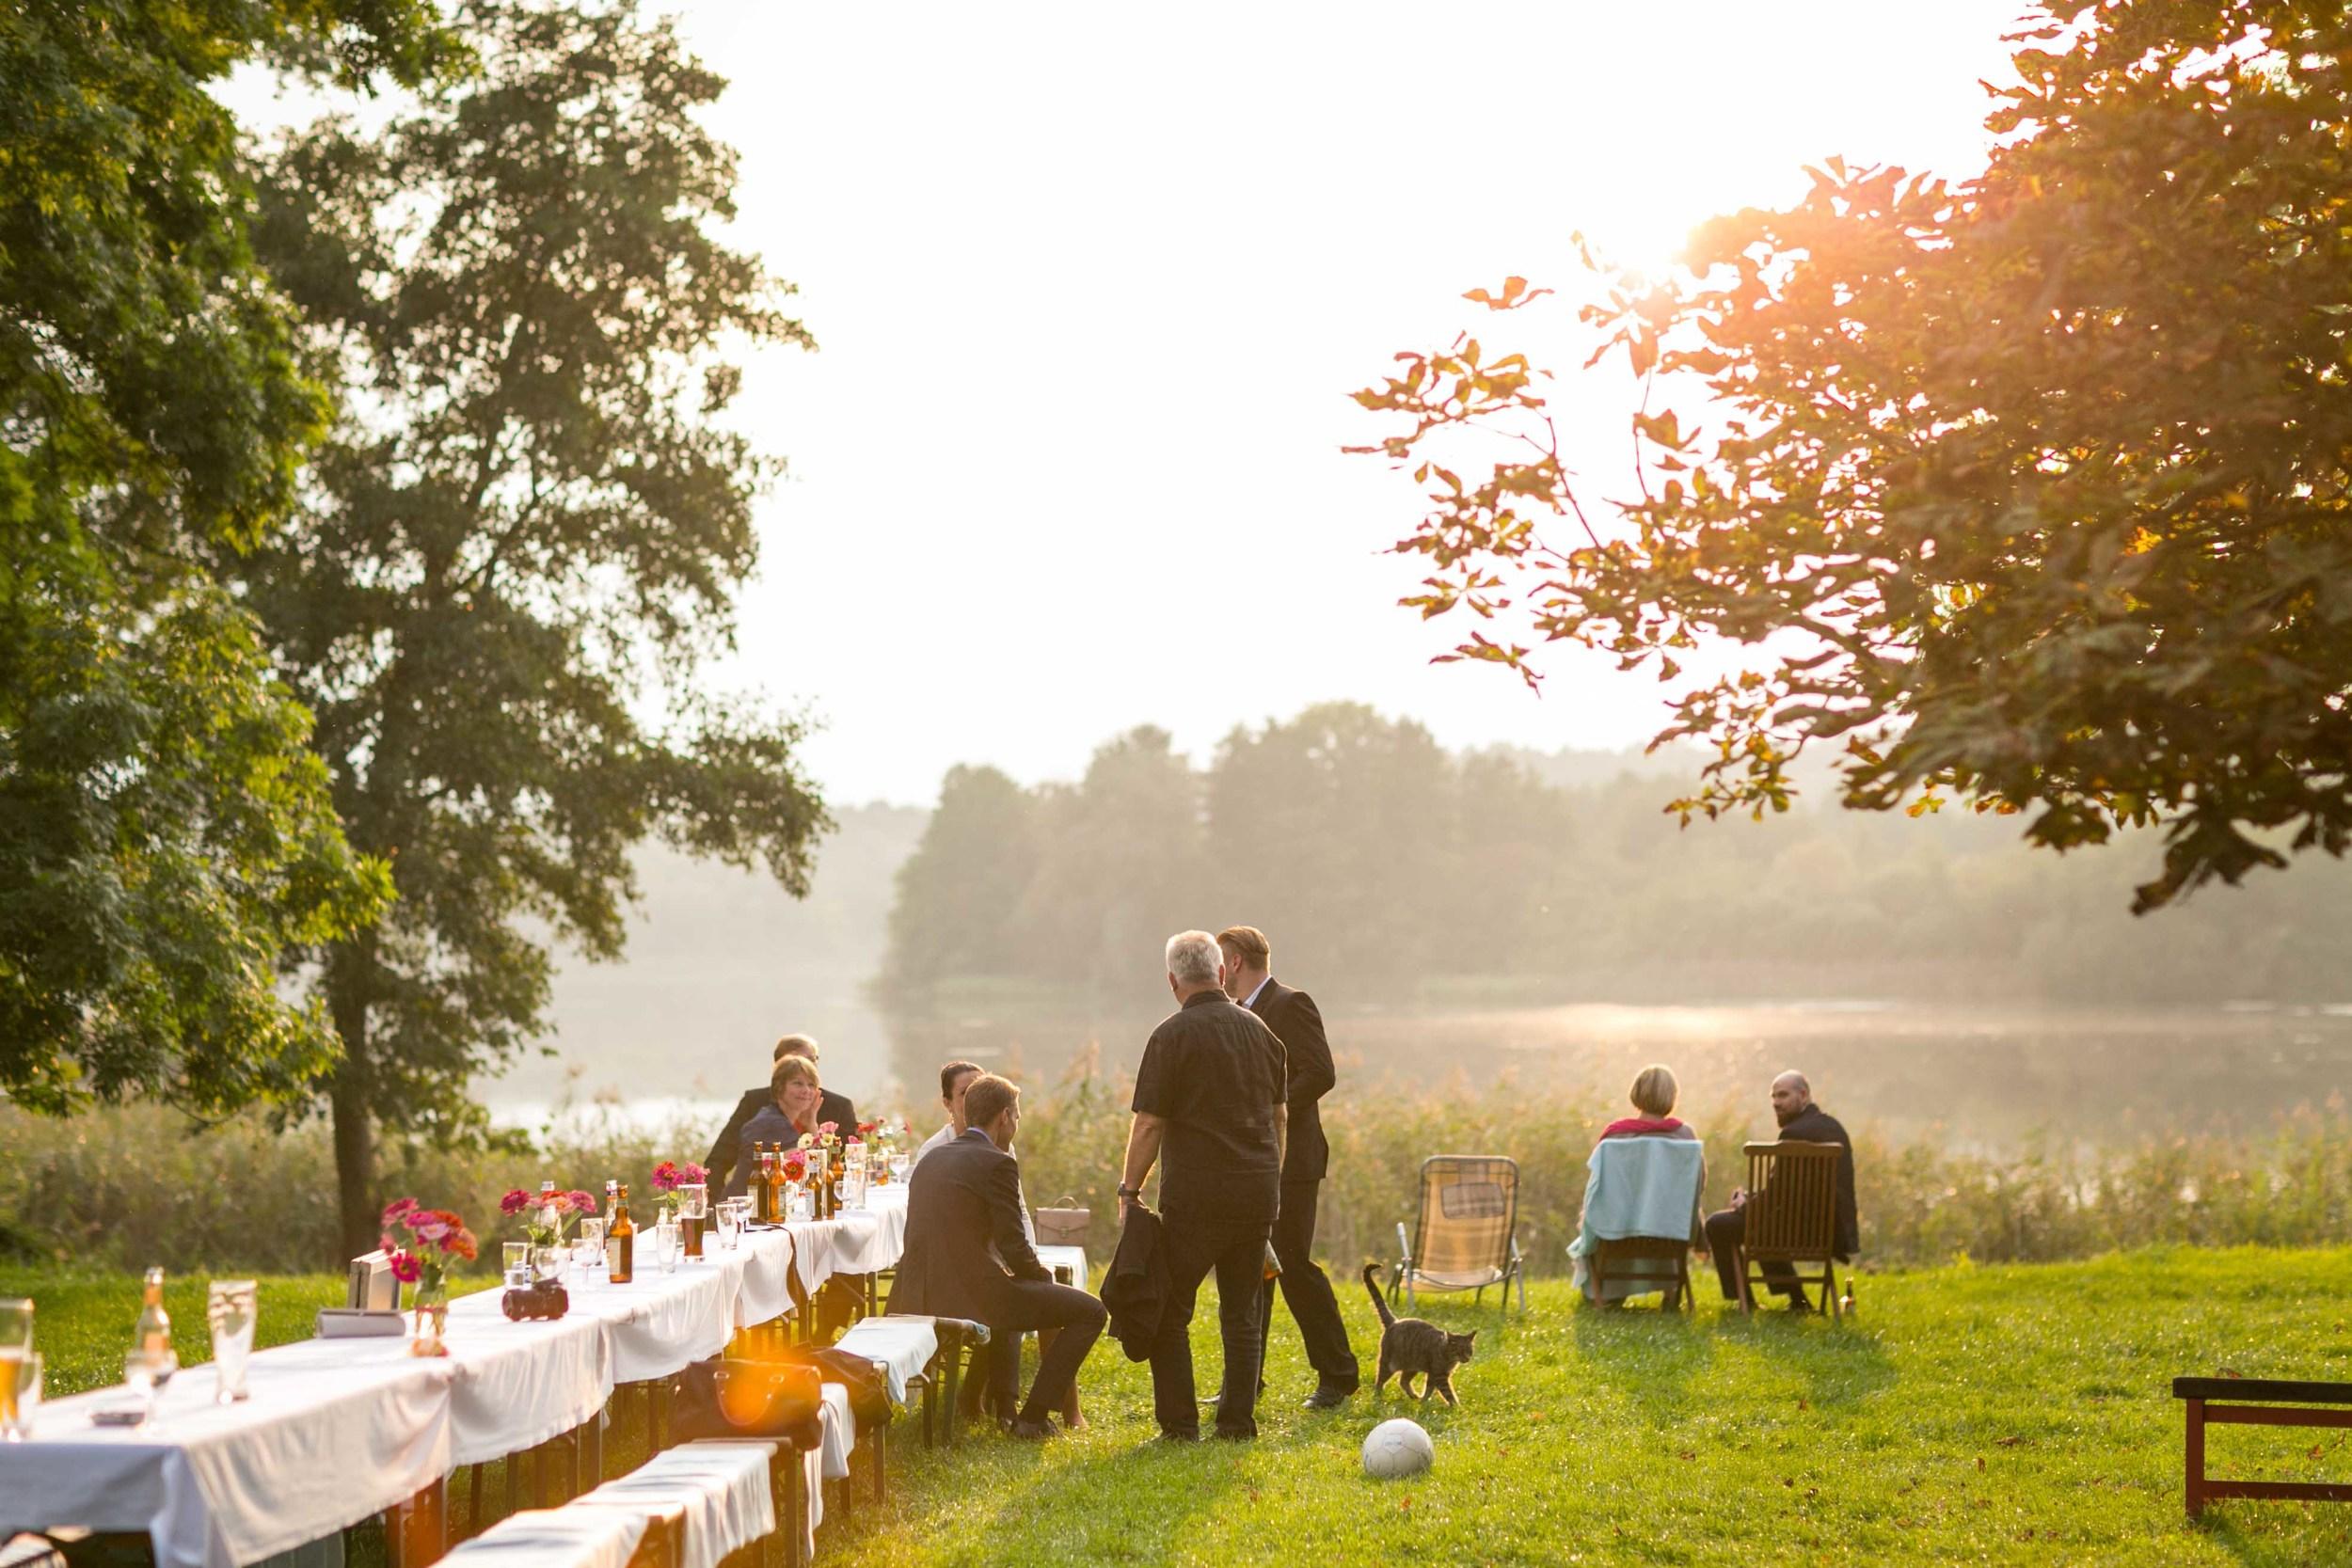 Fran Burrows Hochzeitsfotografie_Kulturgut Wrechen Hochzeit-81.jpg